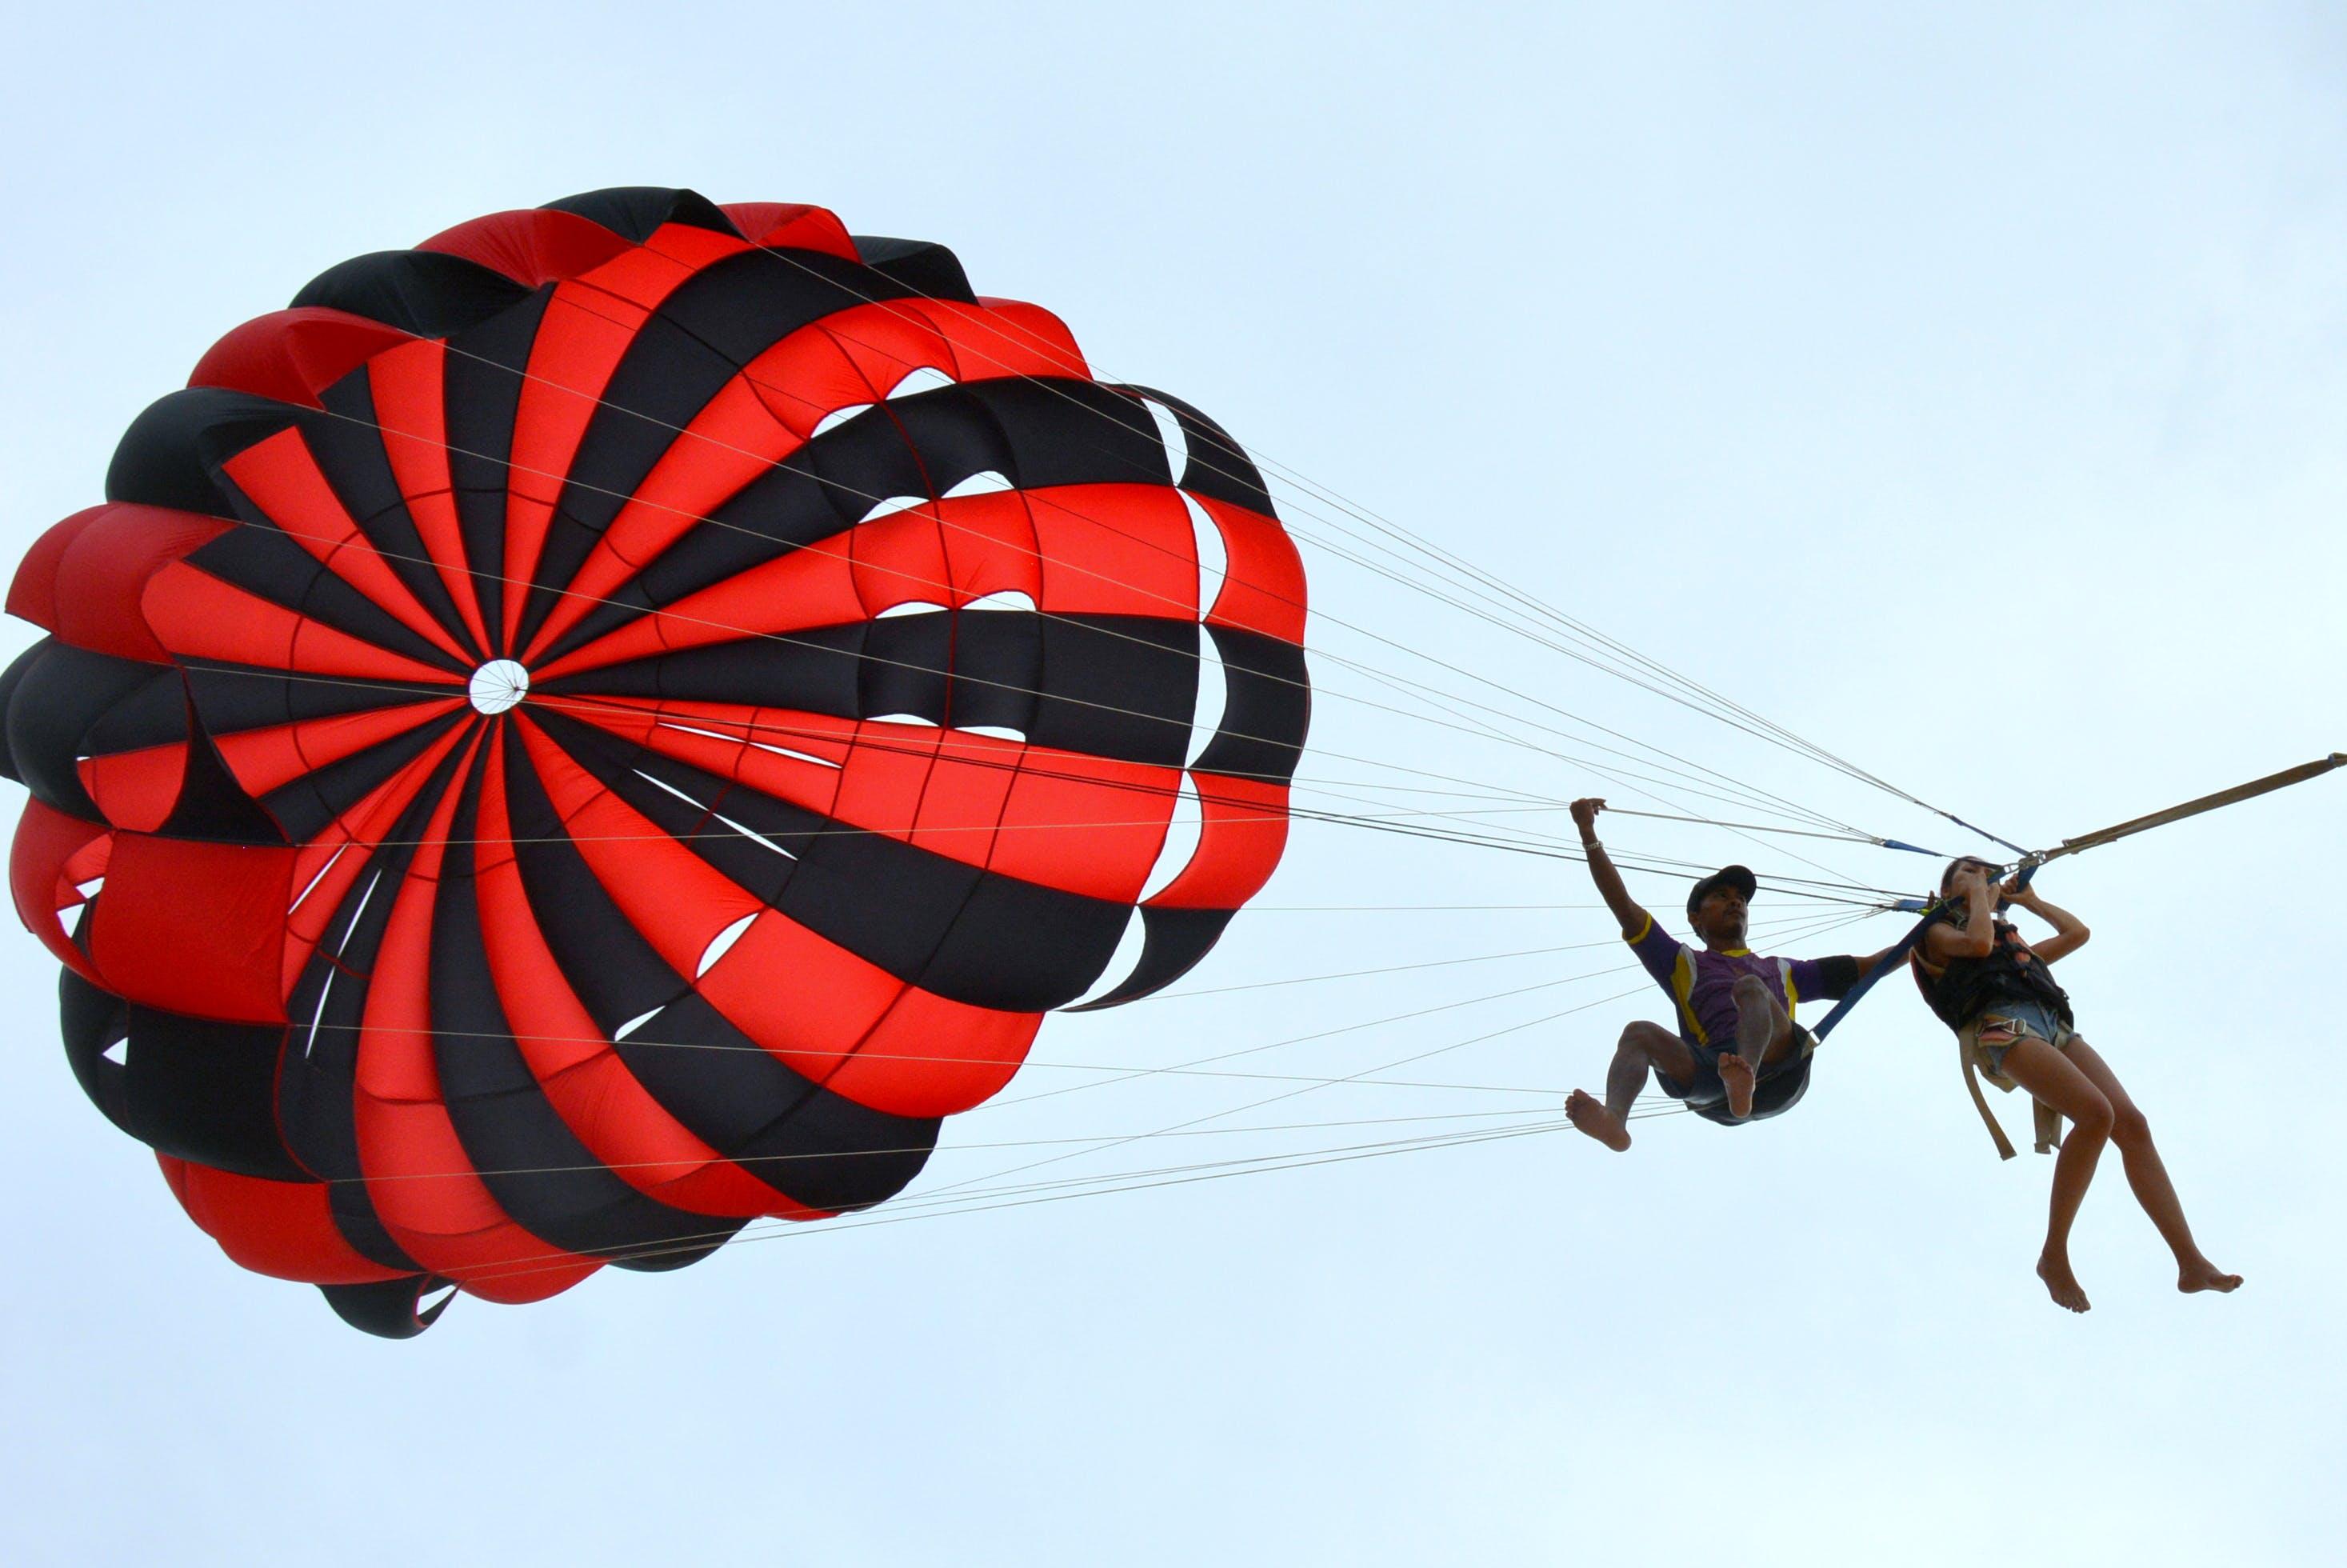 Free stock photo of #parasailing